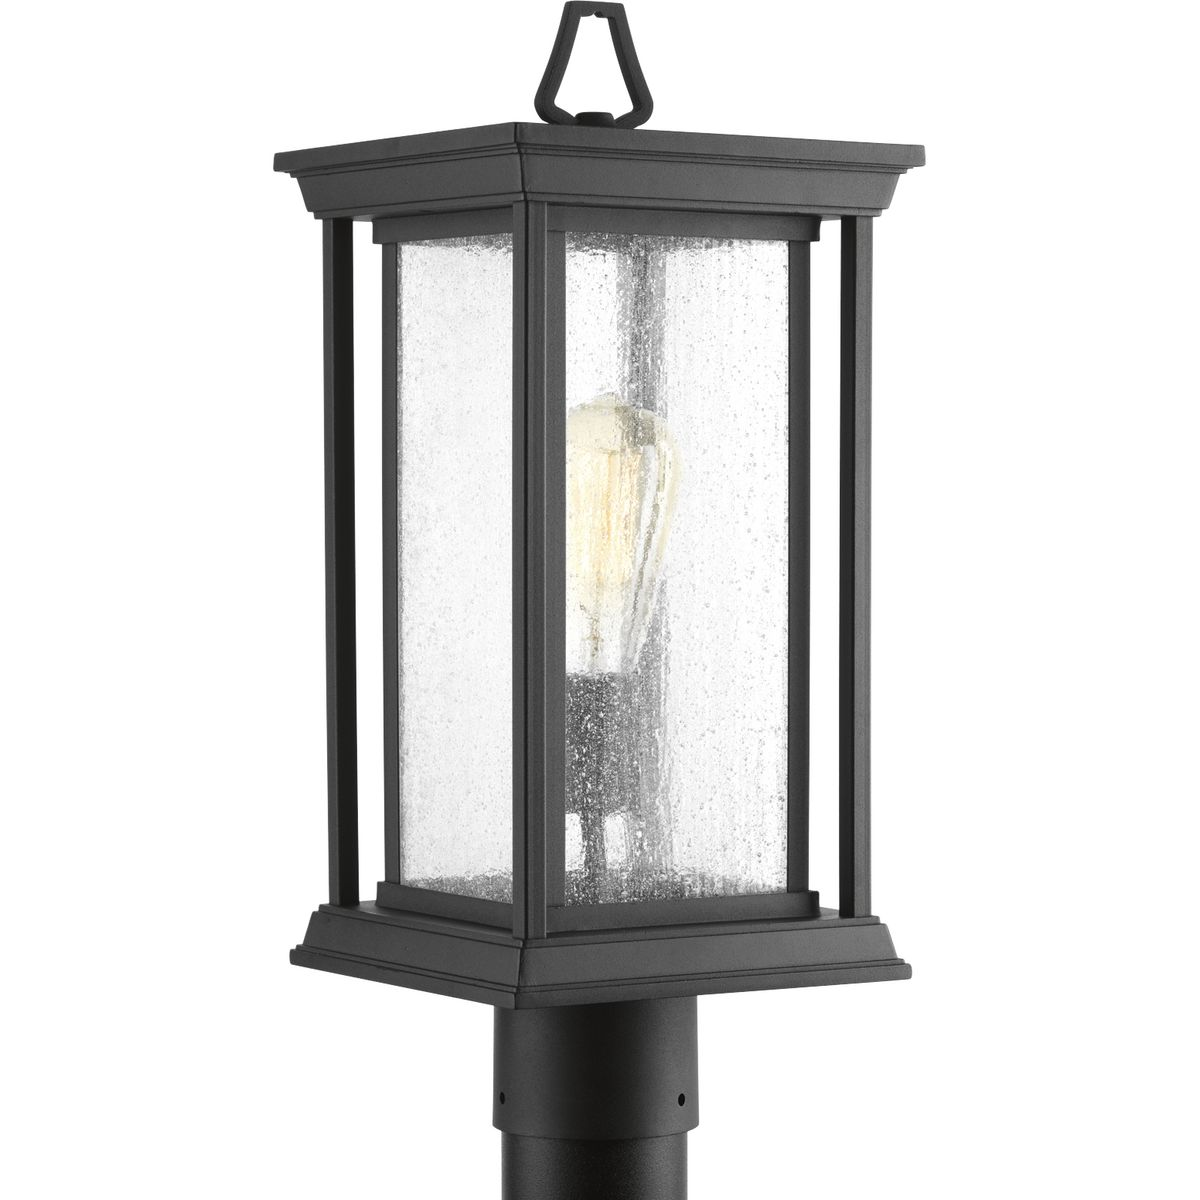 PRO P5400-31 1X100M Endicott Black Post Lantern Clear Seeded Glass